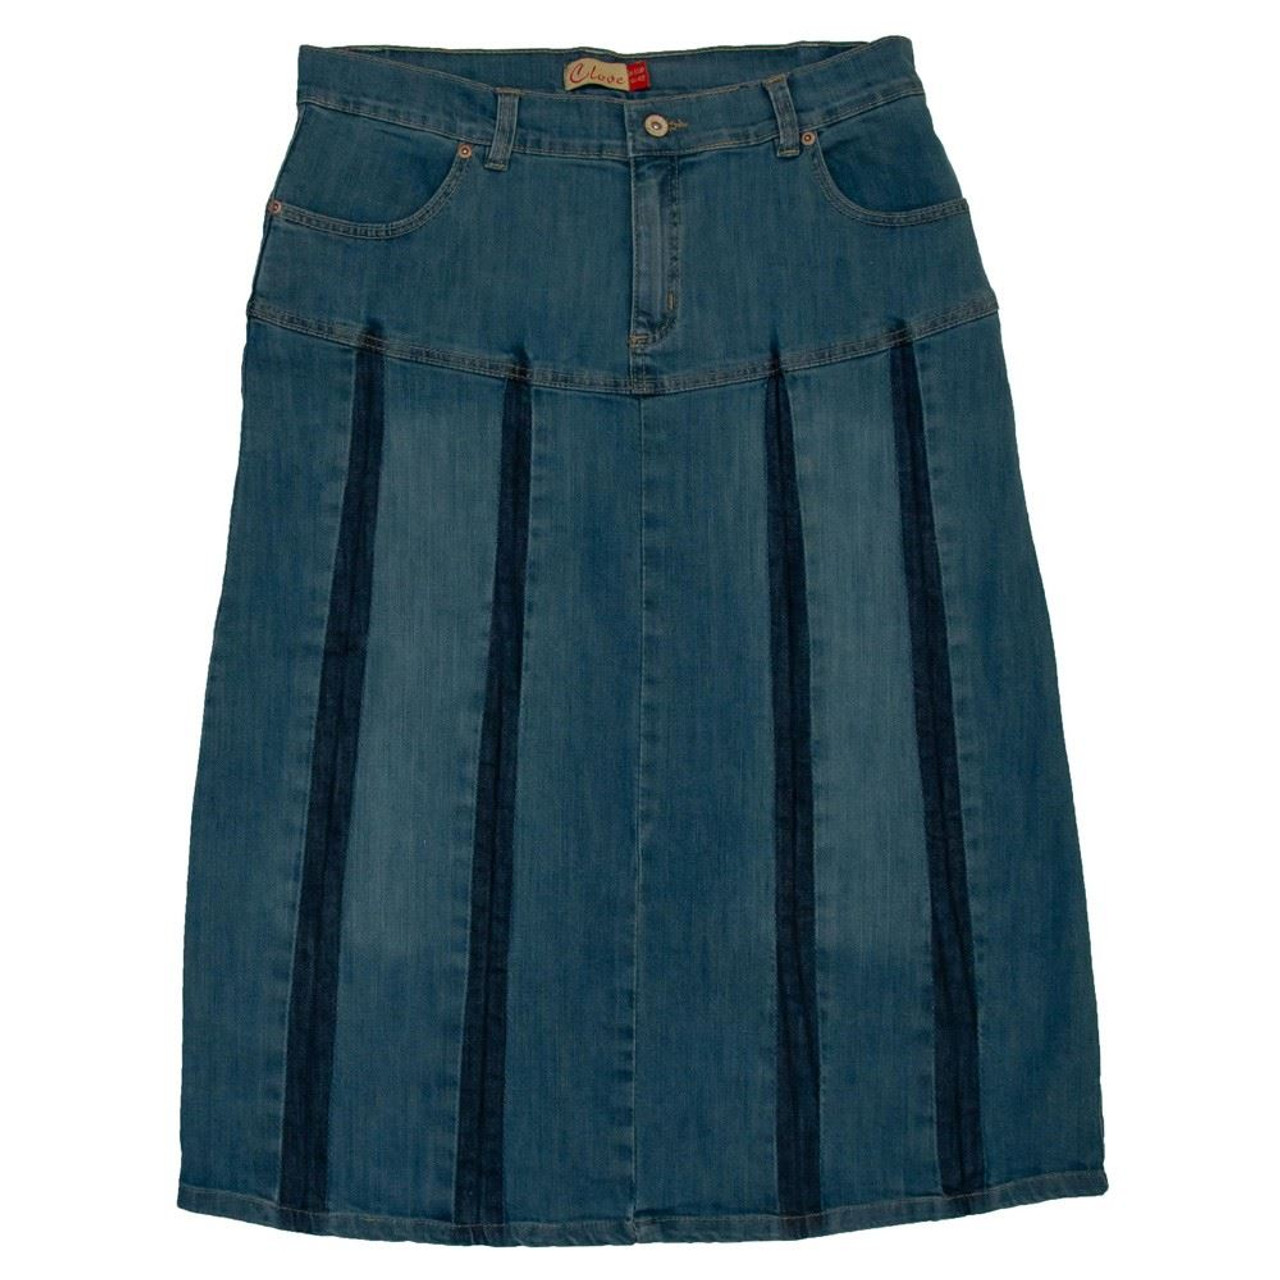 5b0947f4962f3 Clove A Line pleated Blue Denim Jeans Womens Midi Skirt Plus Size 14 16 18  20 22 24 - Jeans Oasis